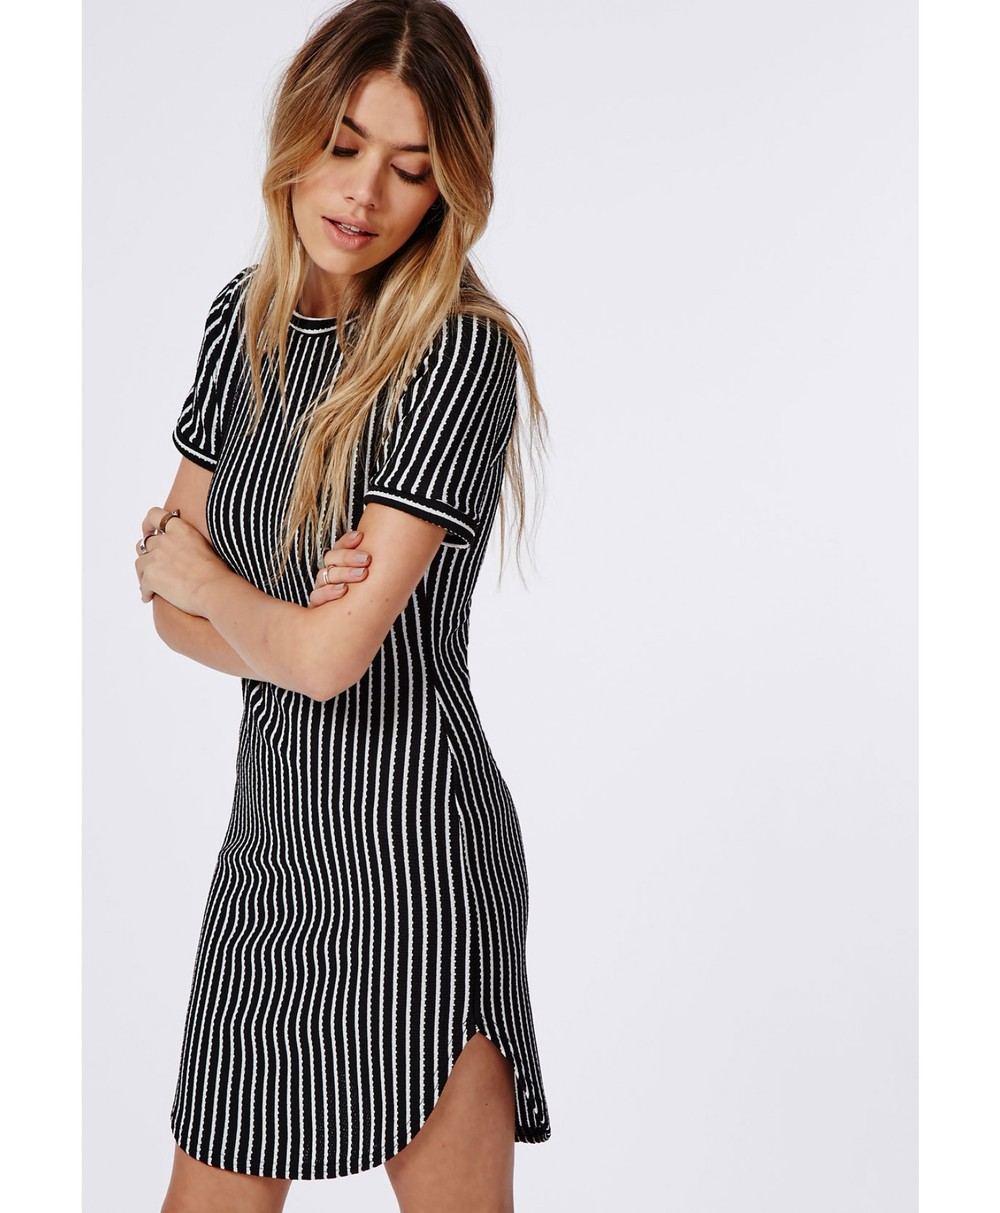 63b6af3a013 Stripe Curve Hem T Shirt Dress In Wholesale - Buy Curve Hem T Shirt ...